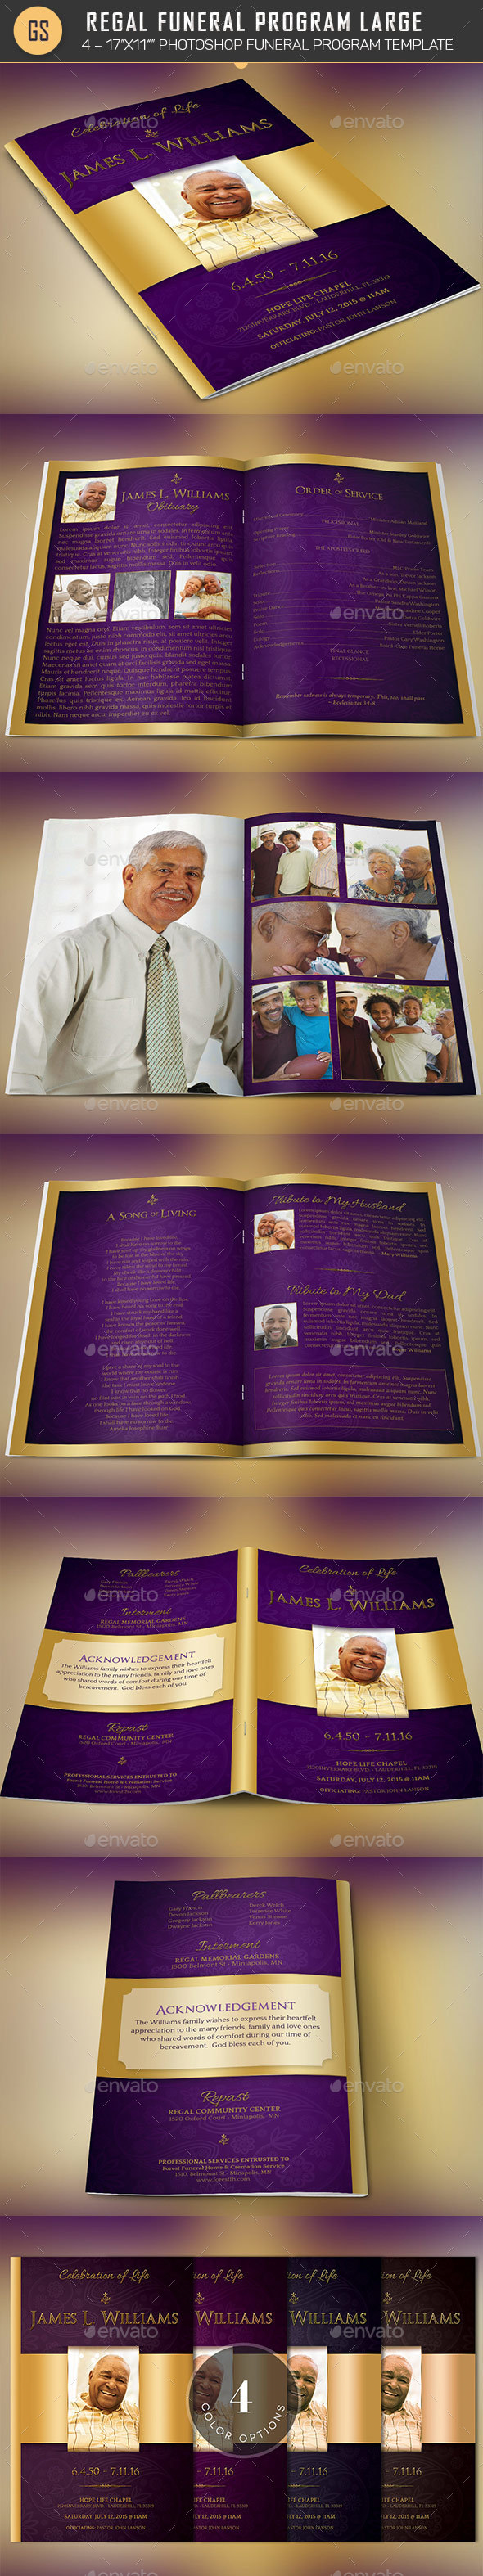 Regal Funeral Program Template Large - Informational Brochures